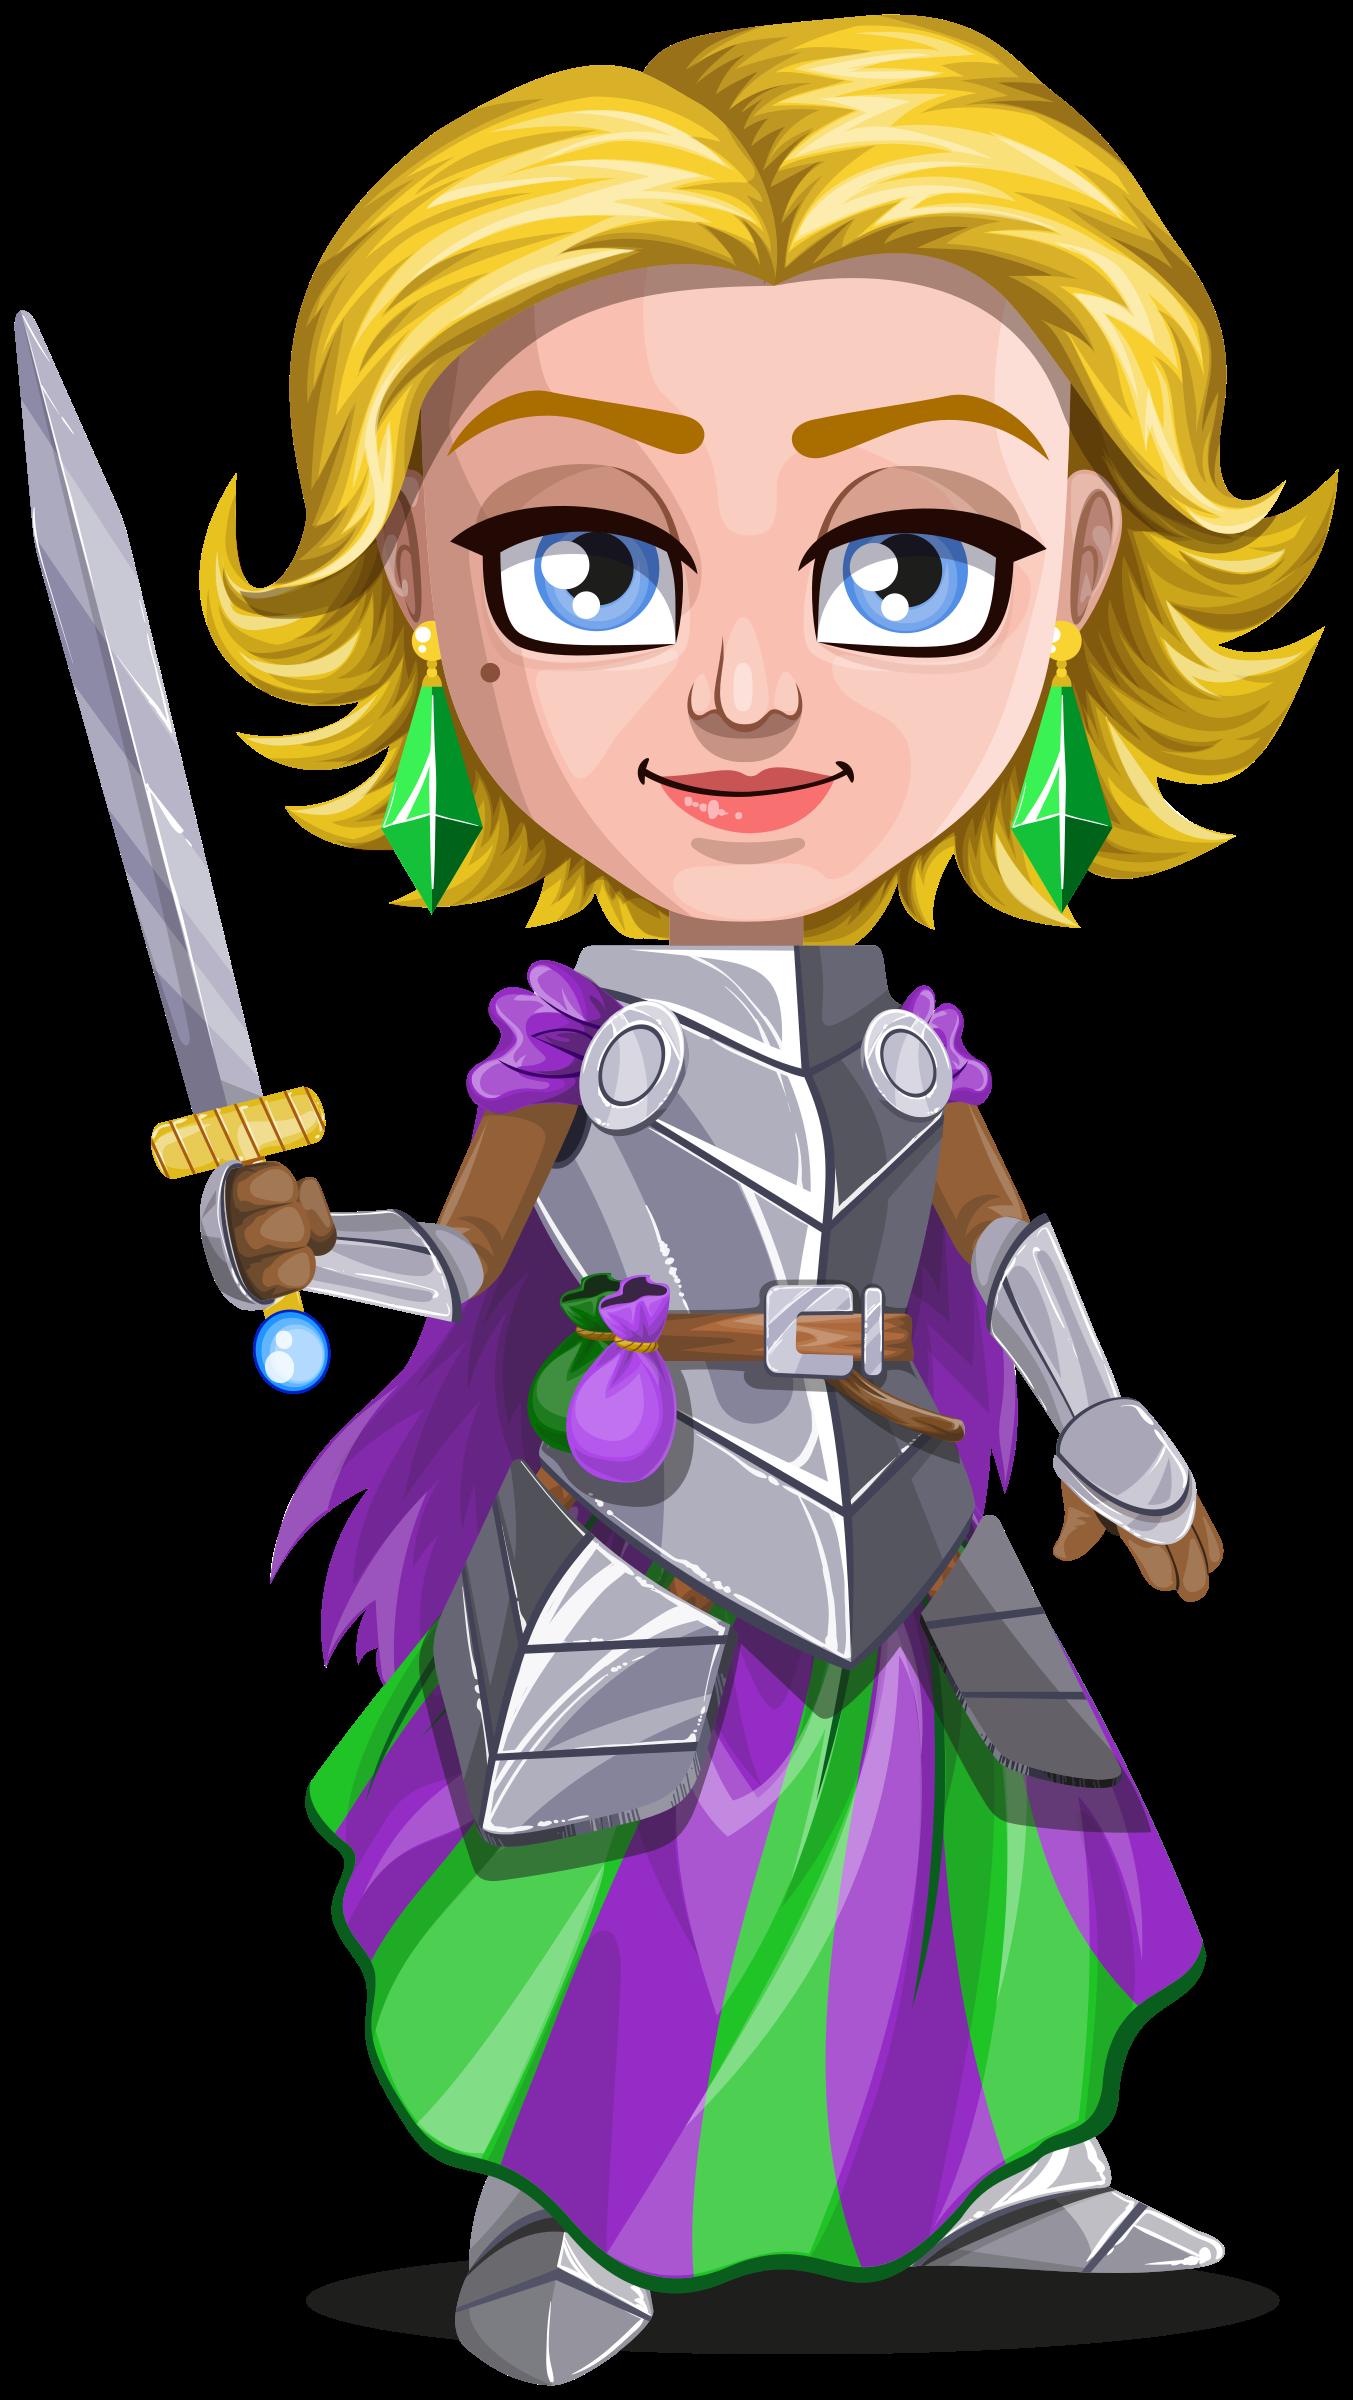 Clipart woman knight, Clipart woman knight Transparent FREE.